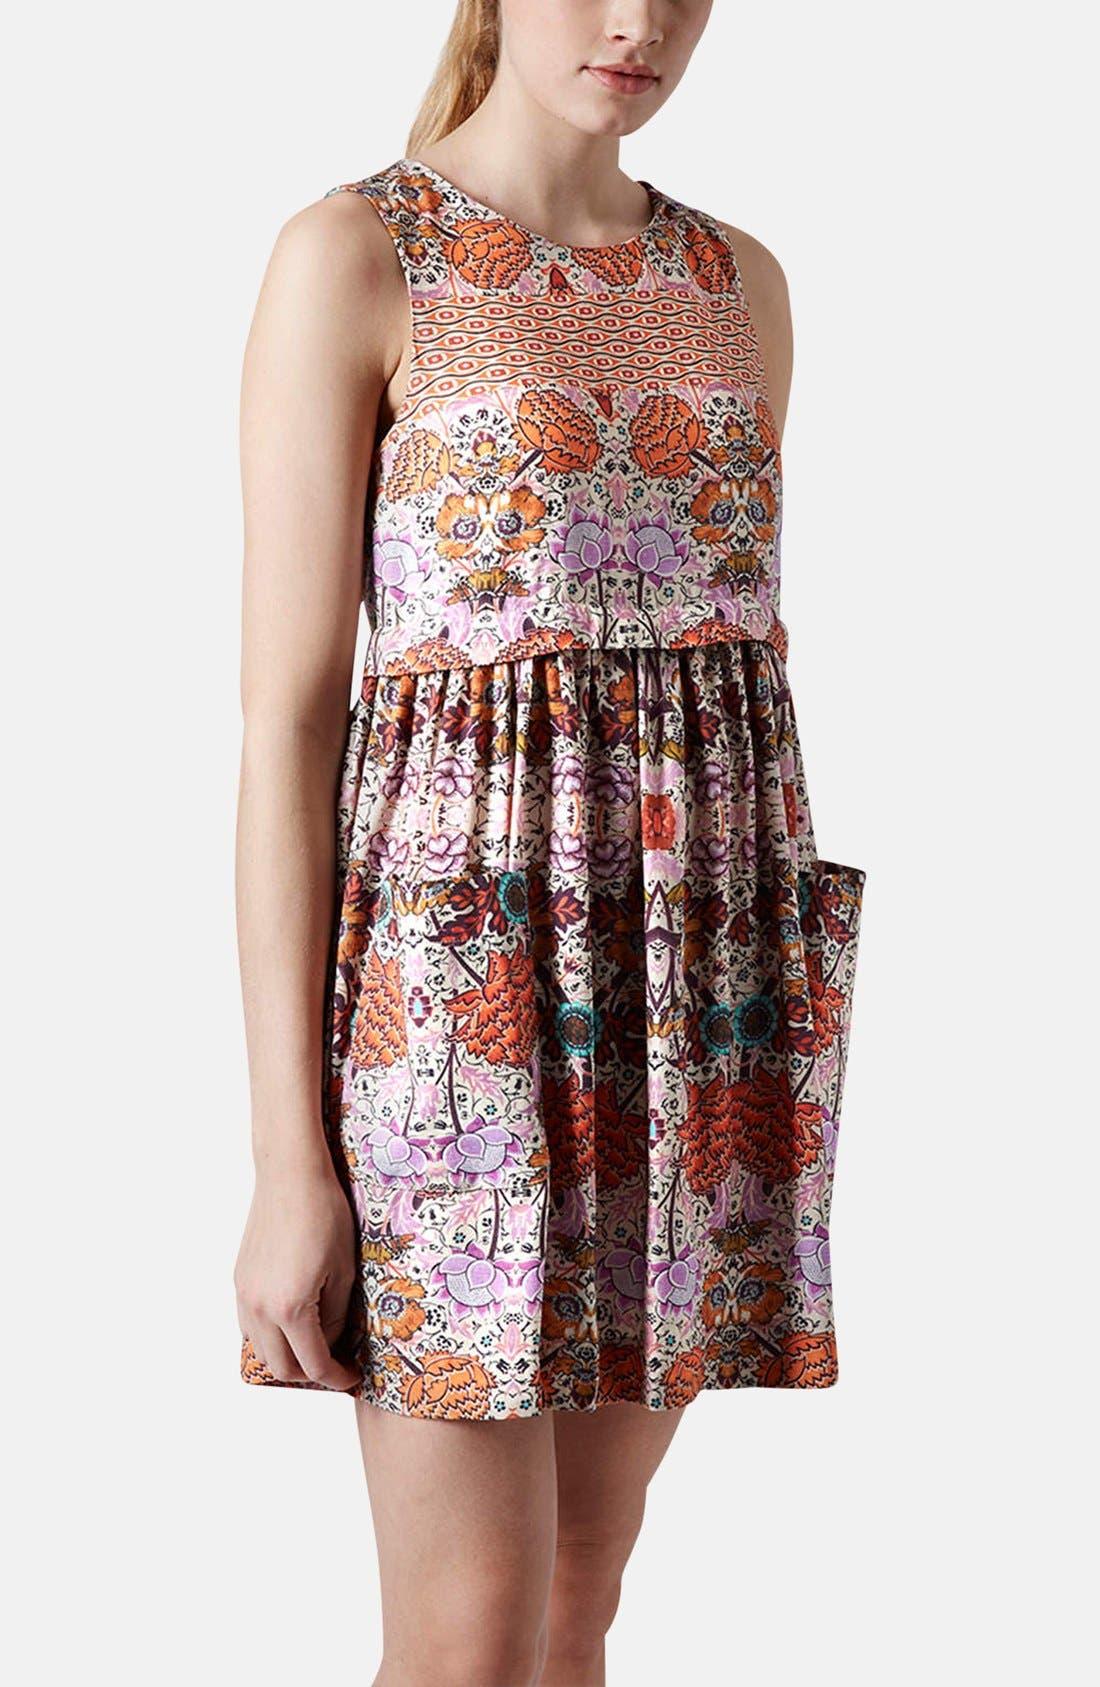 Alternate Image 1 Selected - Topshop 'Folklore' Print Shift Dress